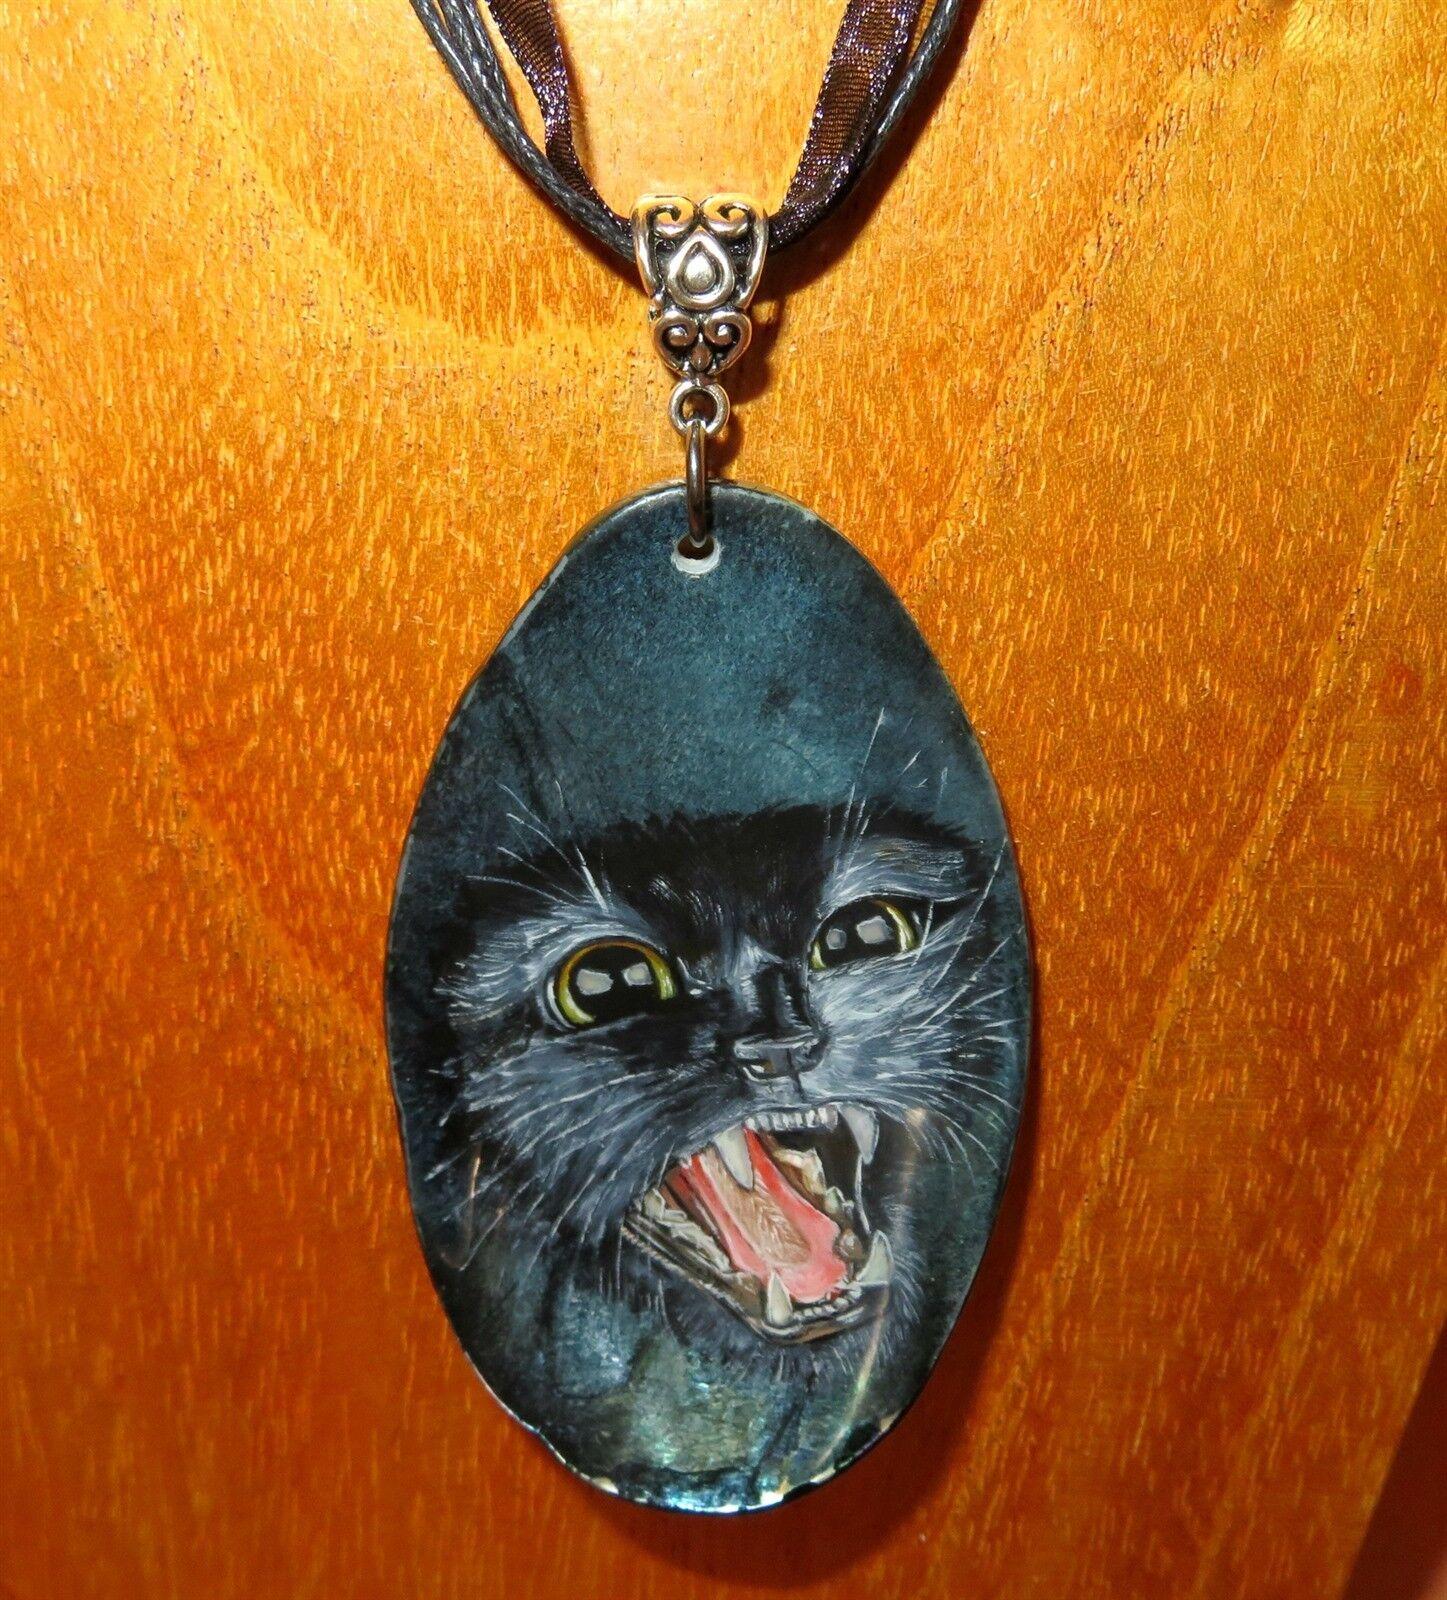 Concha Abalon Colgante Gato black Bruja Familiar Pintado a Mano Ruso Izotov